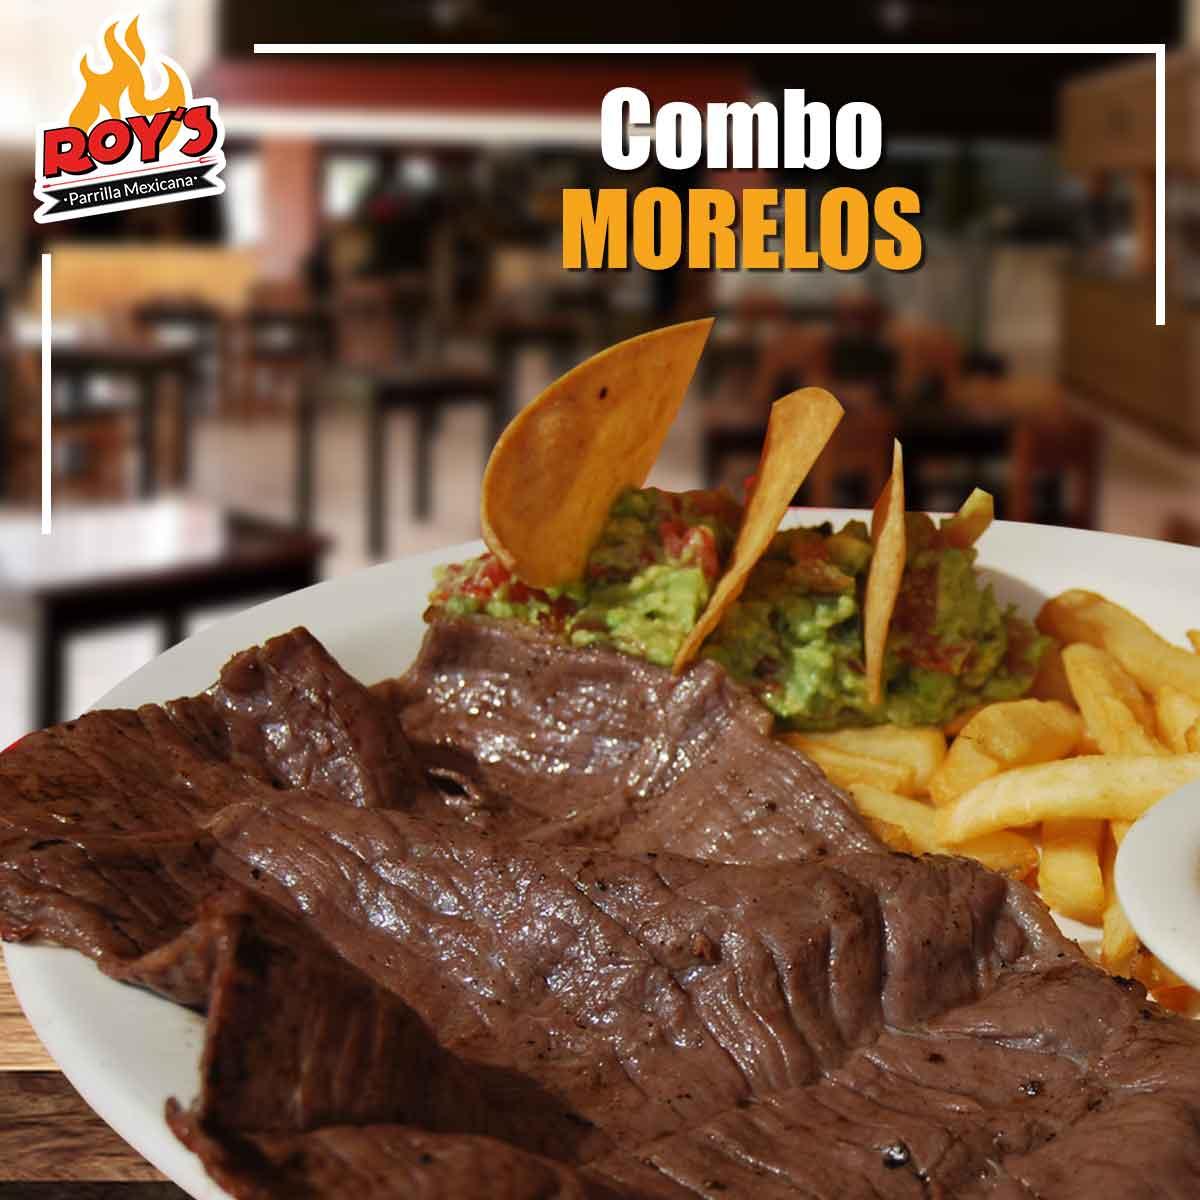 Combo Morelos